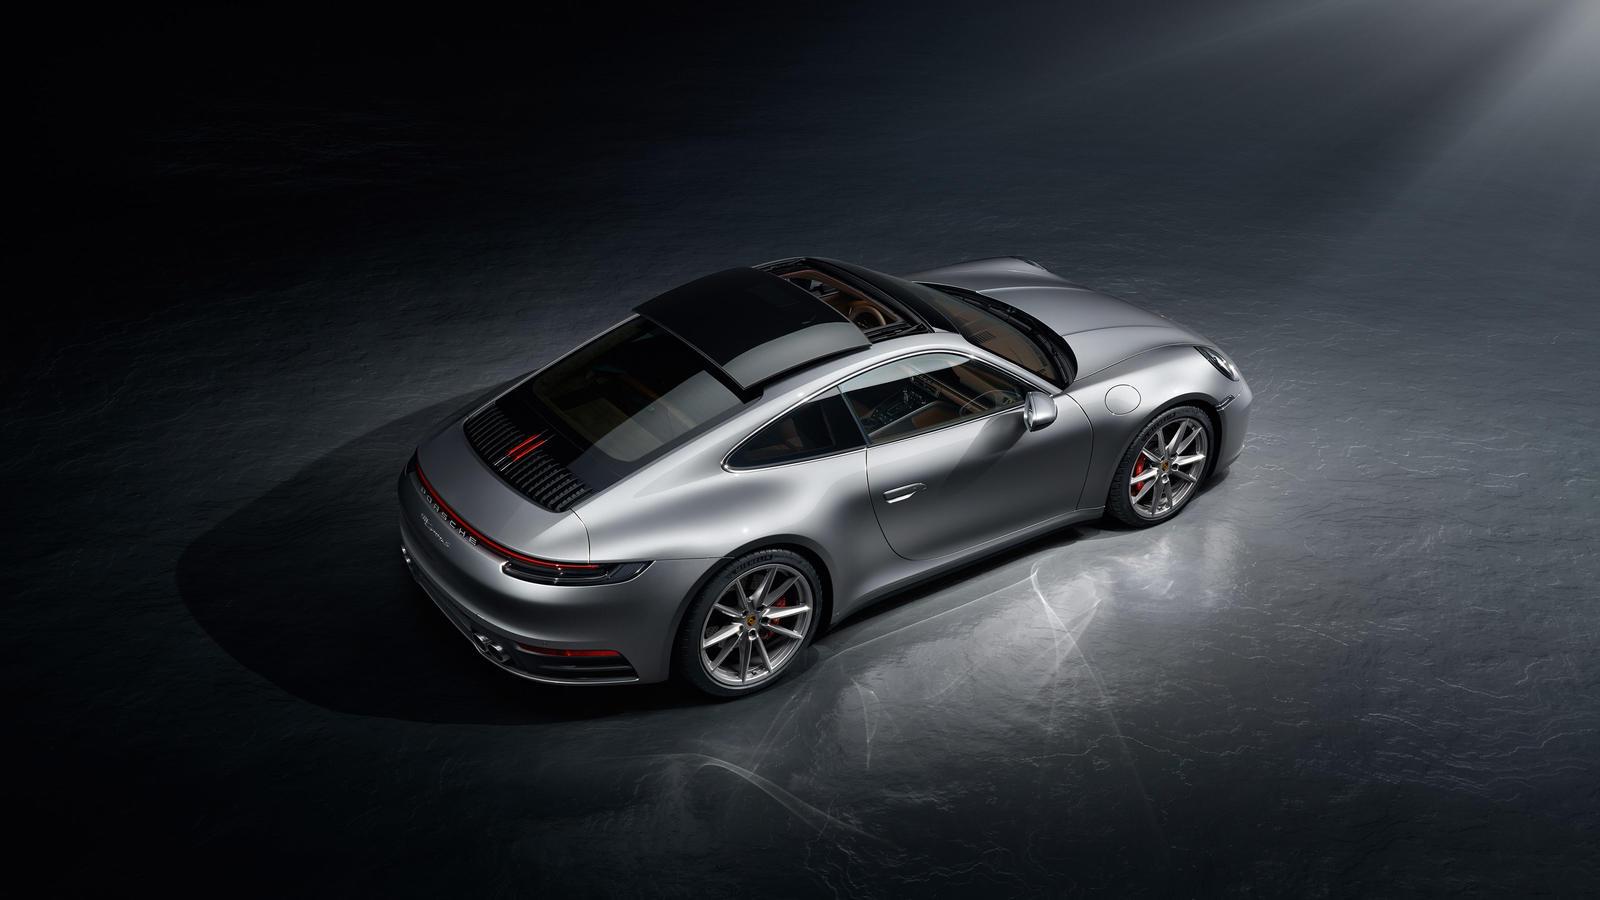 Porsche - 911 Carrera S Coupe - Timeless Machine